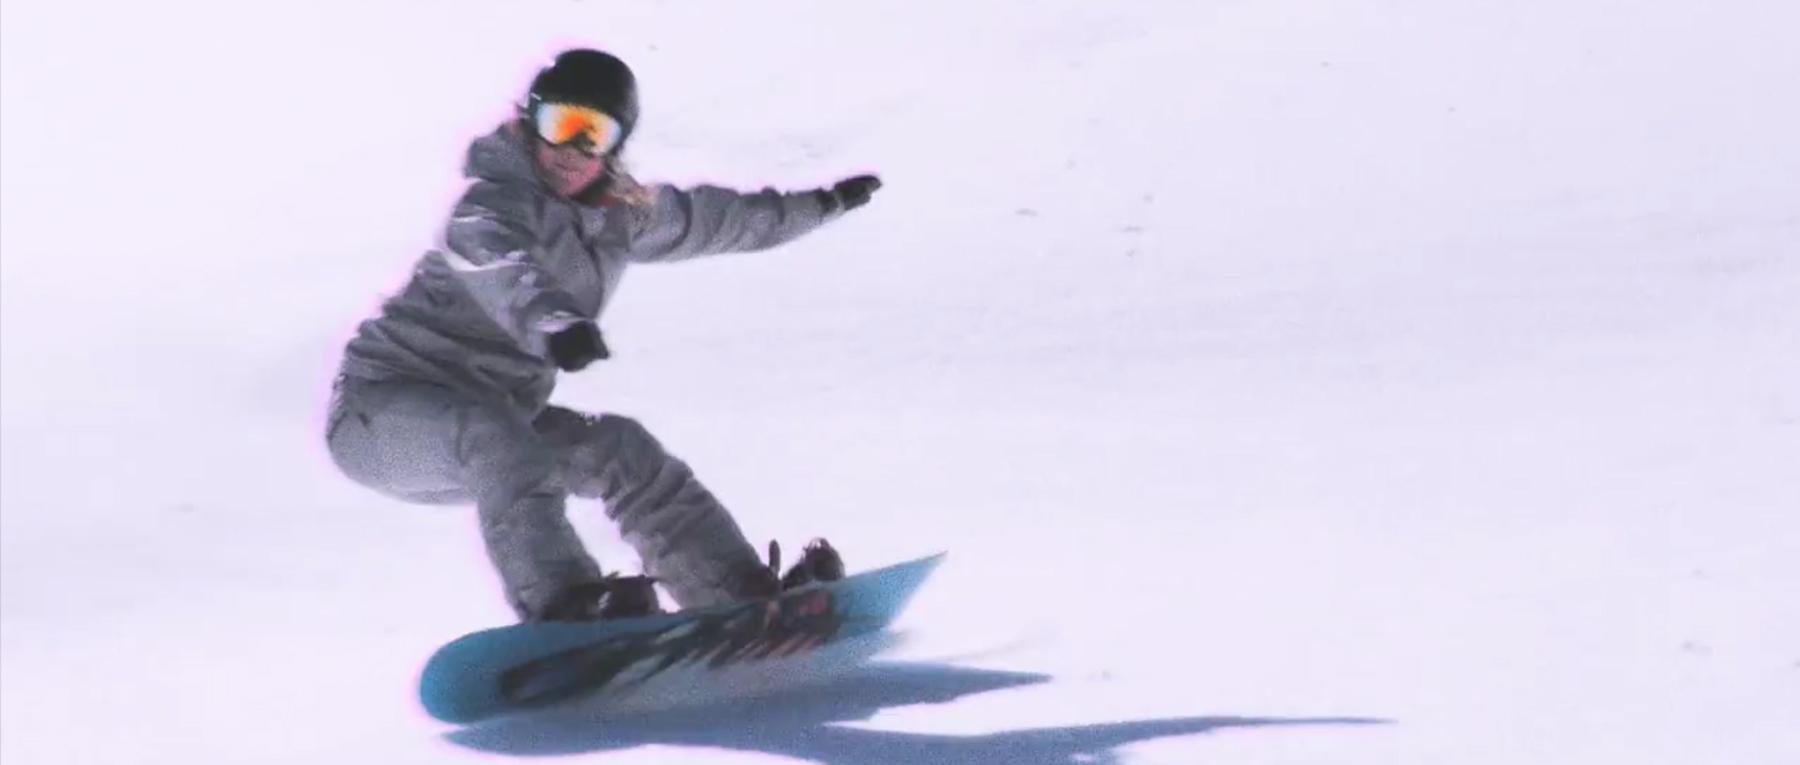 Watch snowboarding olympian Jenny Jones shred for Nissan in this mesmerizing video http://t.co/7md4cd8FNR http://t.co/sQqeAdVjzp